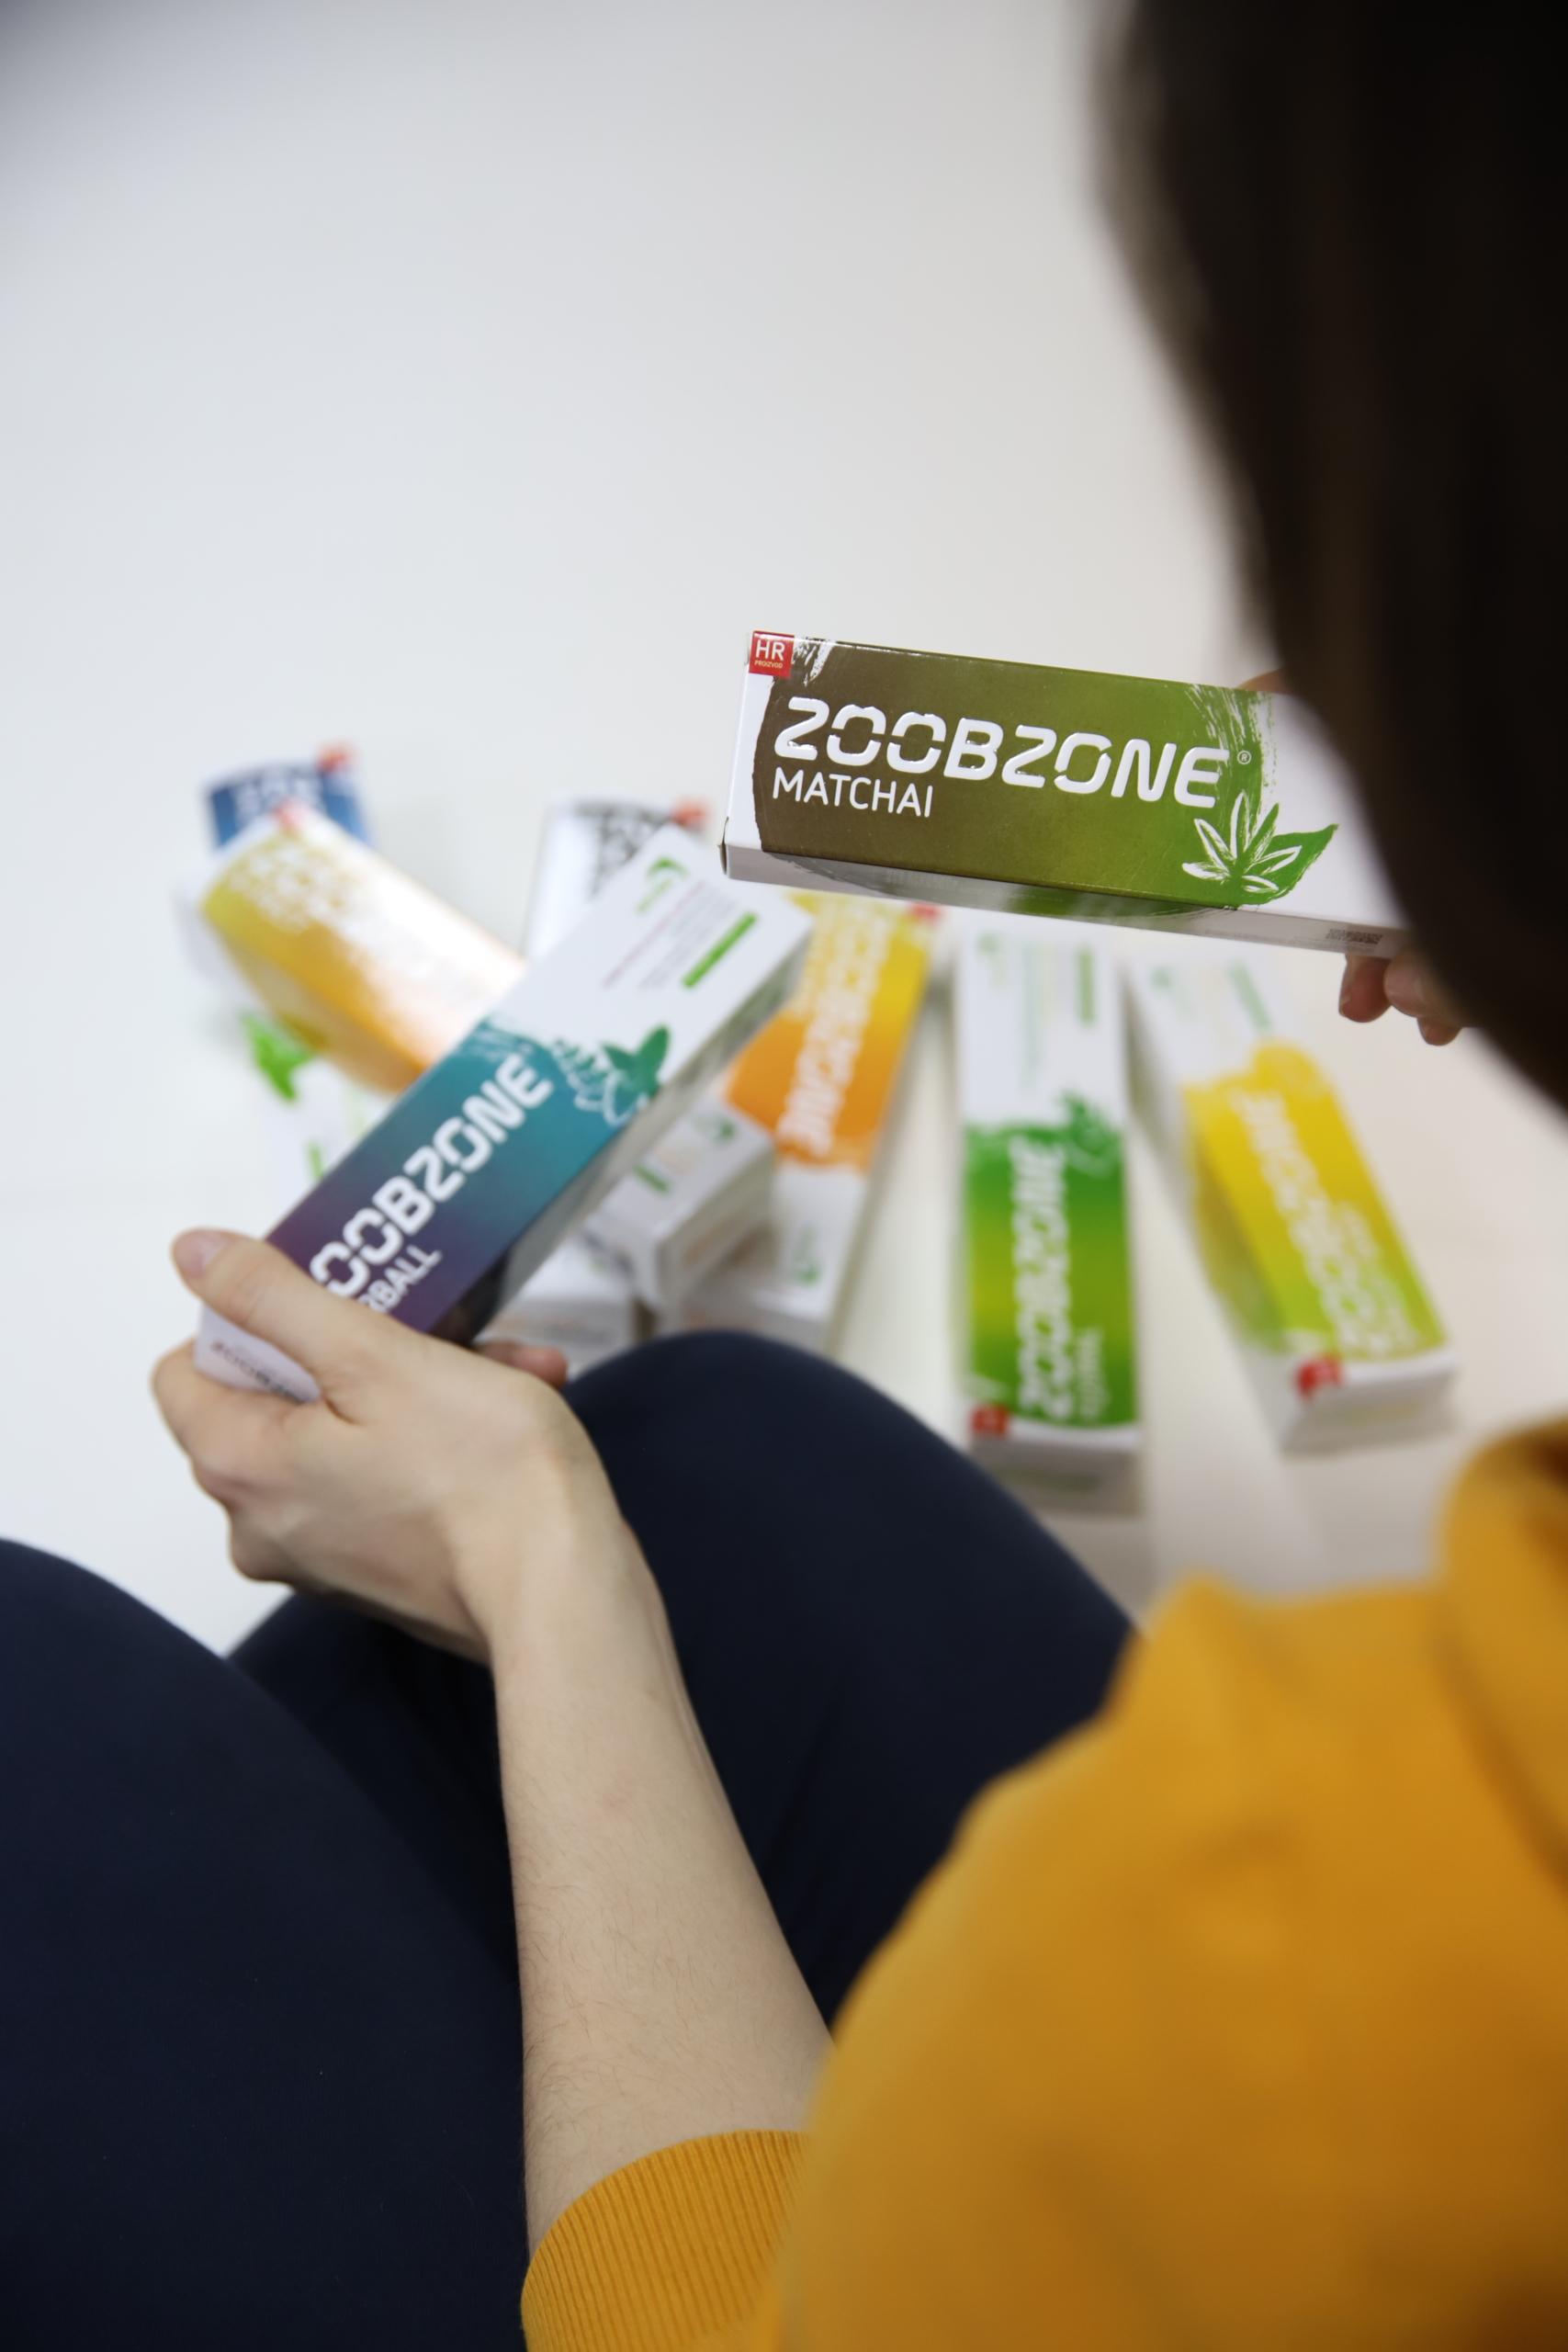 Zoobzobe the most amazing toothpaste